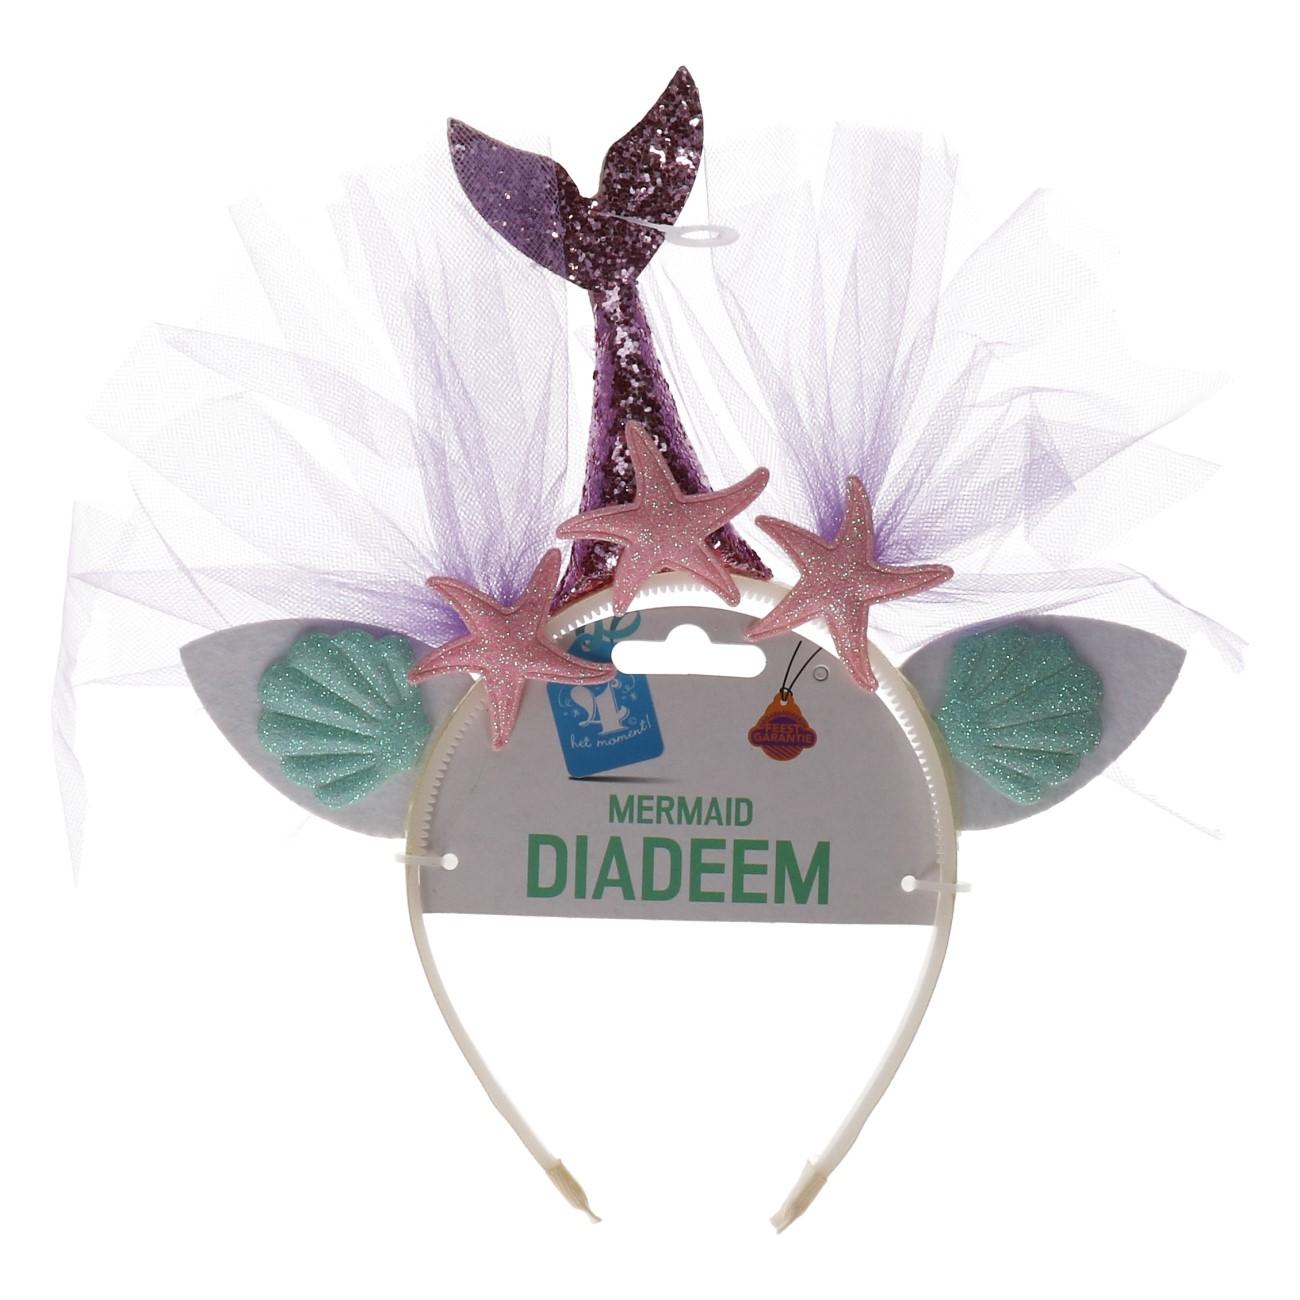 Diadeem mermaid